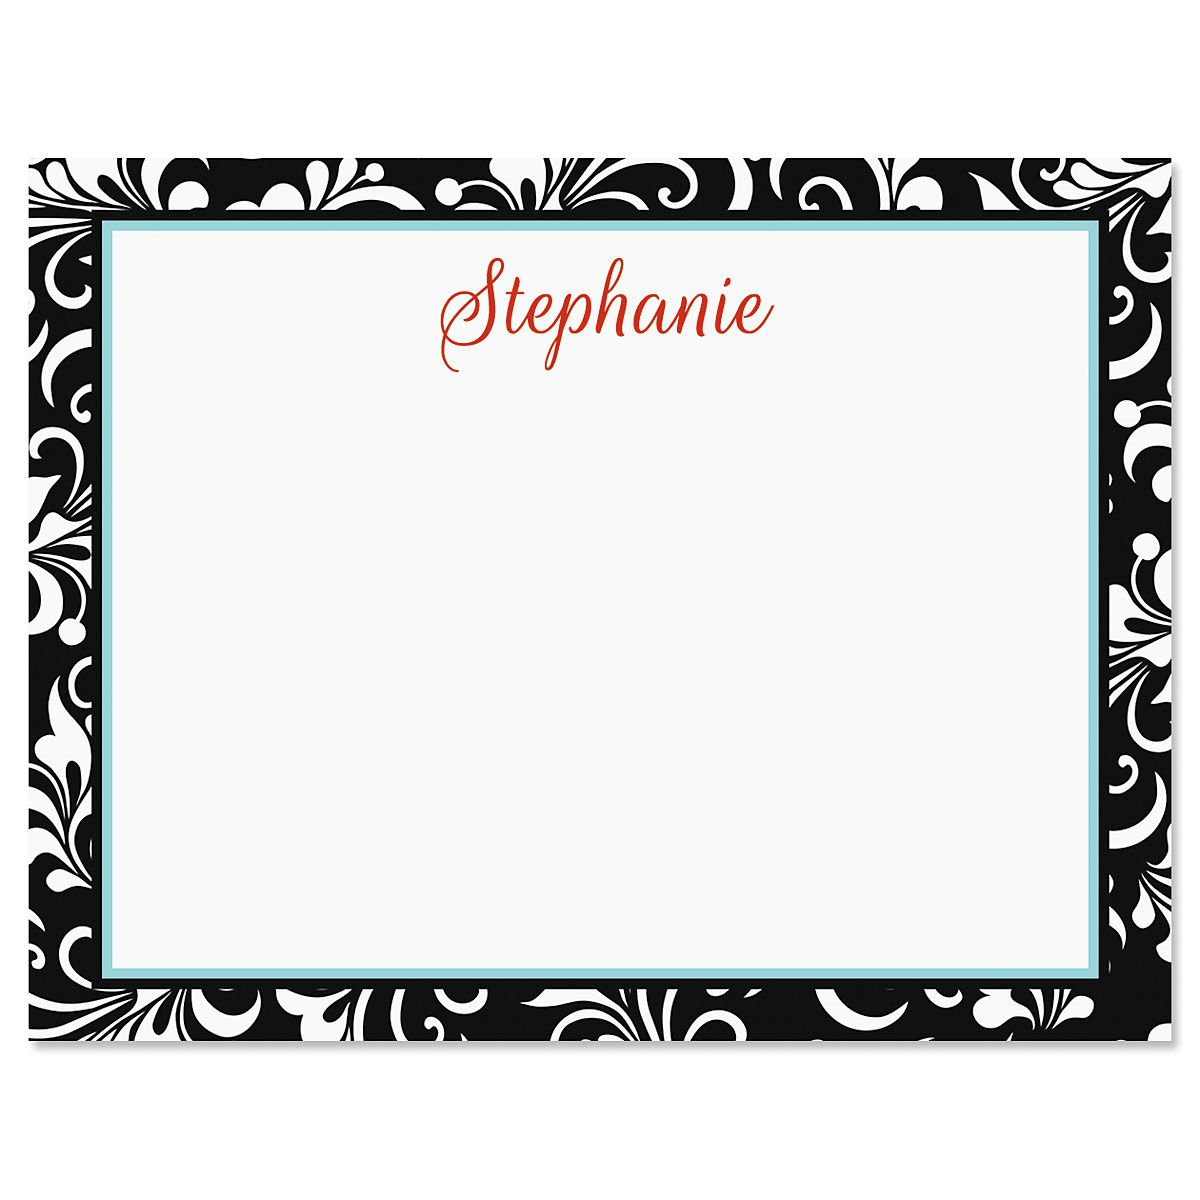 Opulent Correspondence Cards